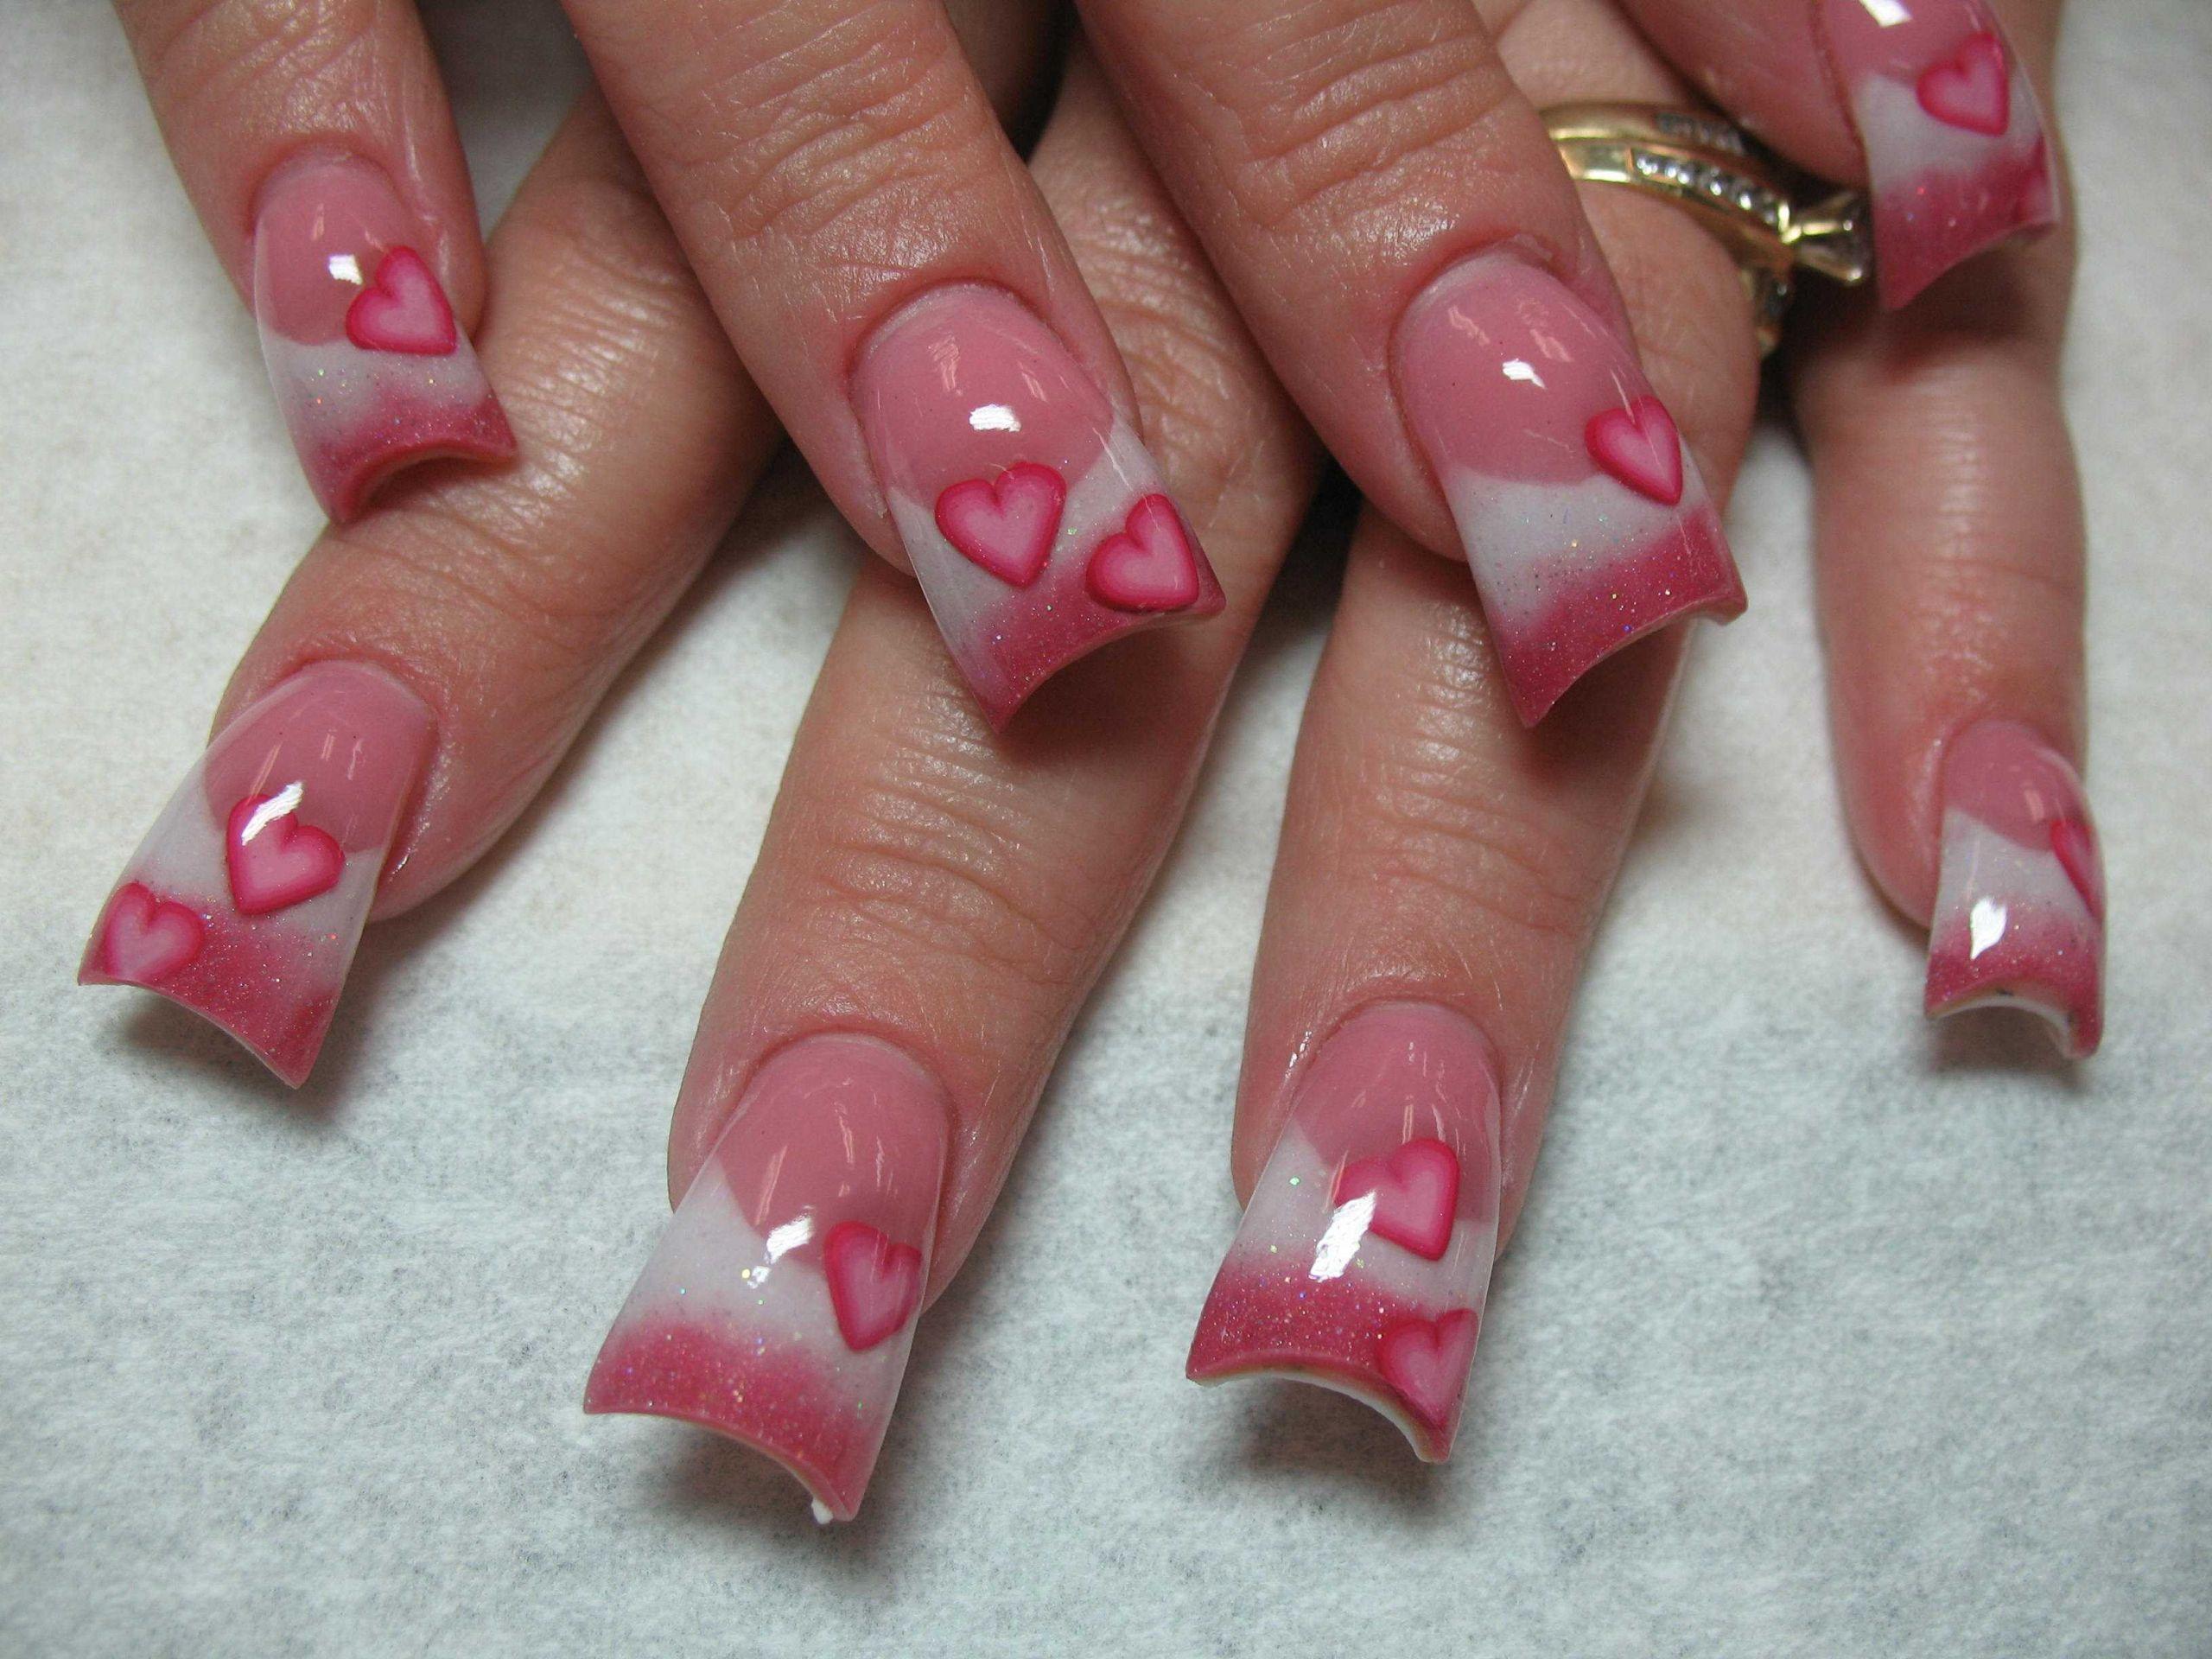 Nail Art Valentines Day Design  Valentine s Day Nails Art Design Ideas ⋆ Instyle Fashion e